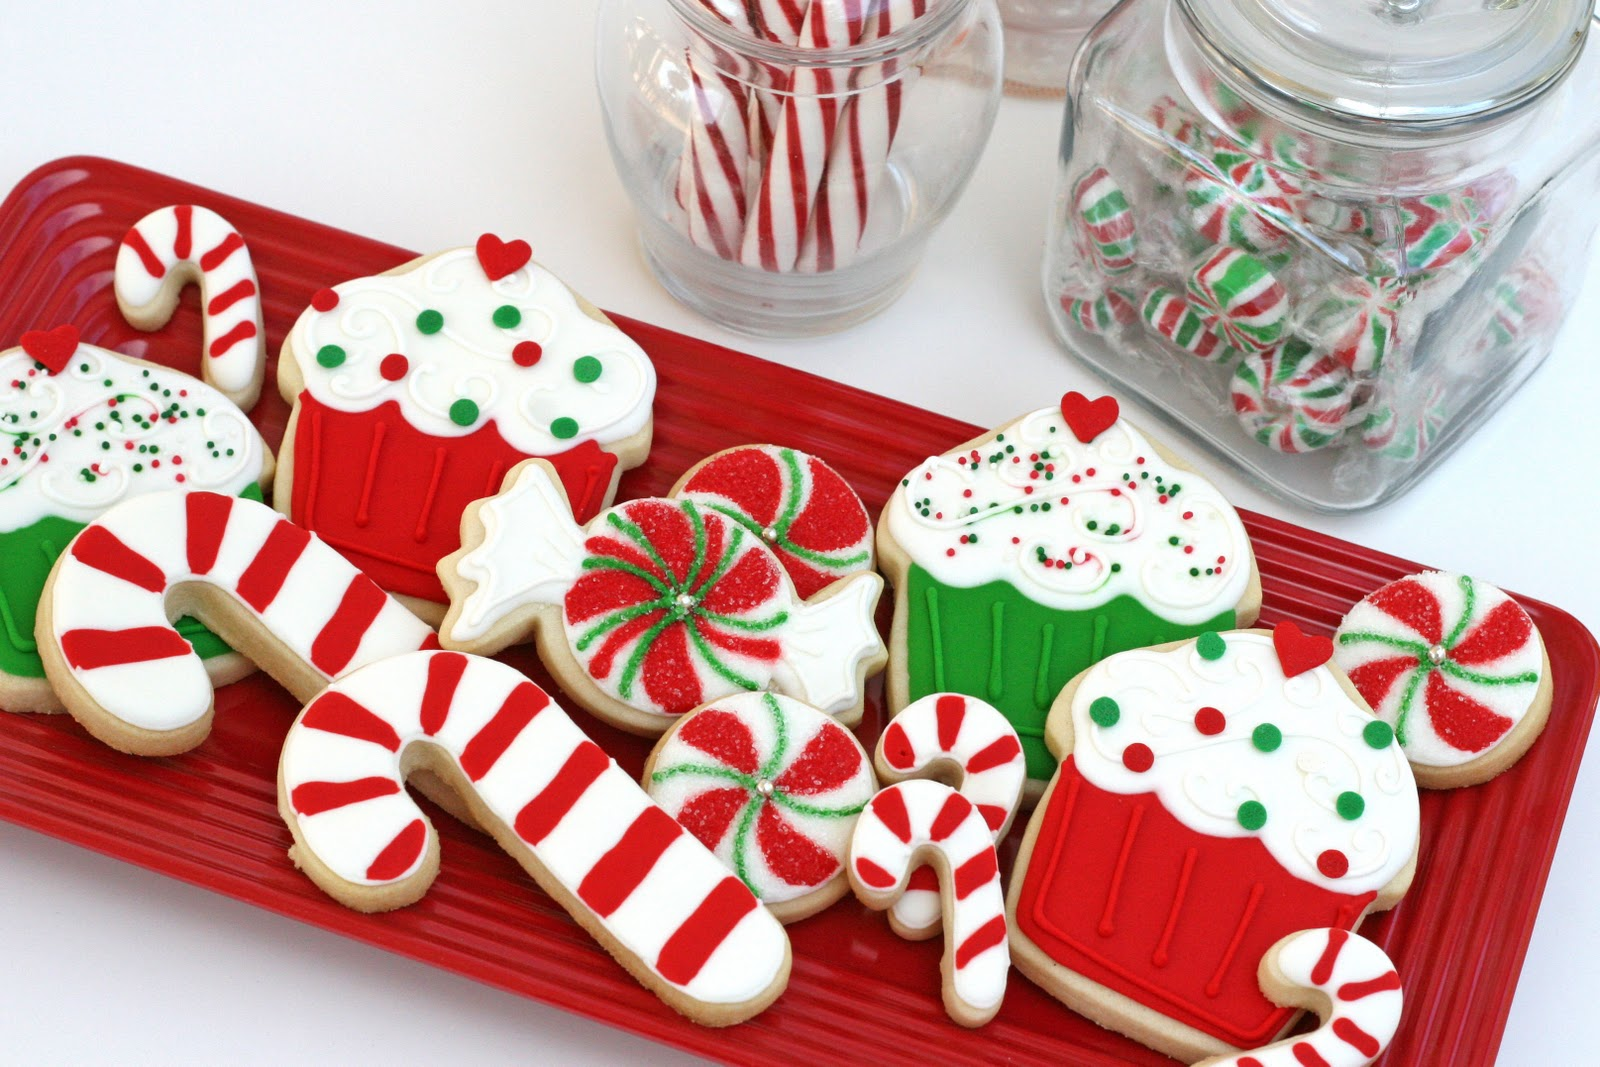 Christmas biscuits, cookies